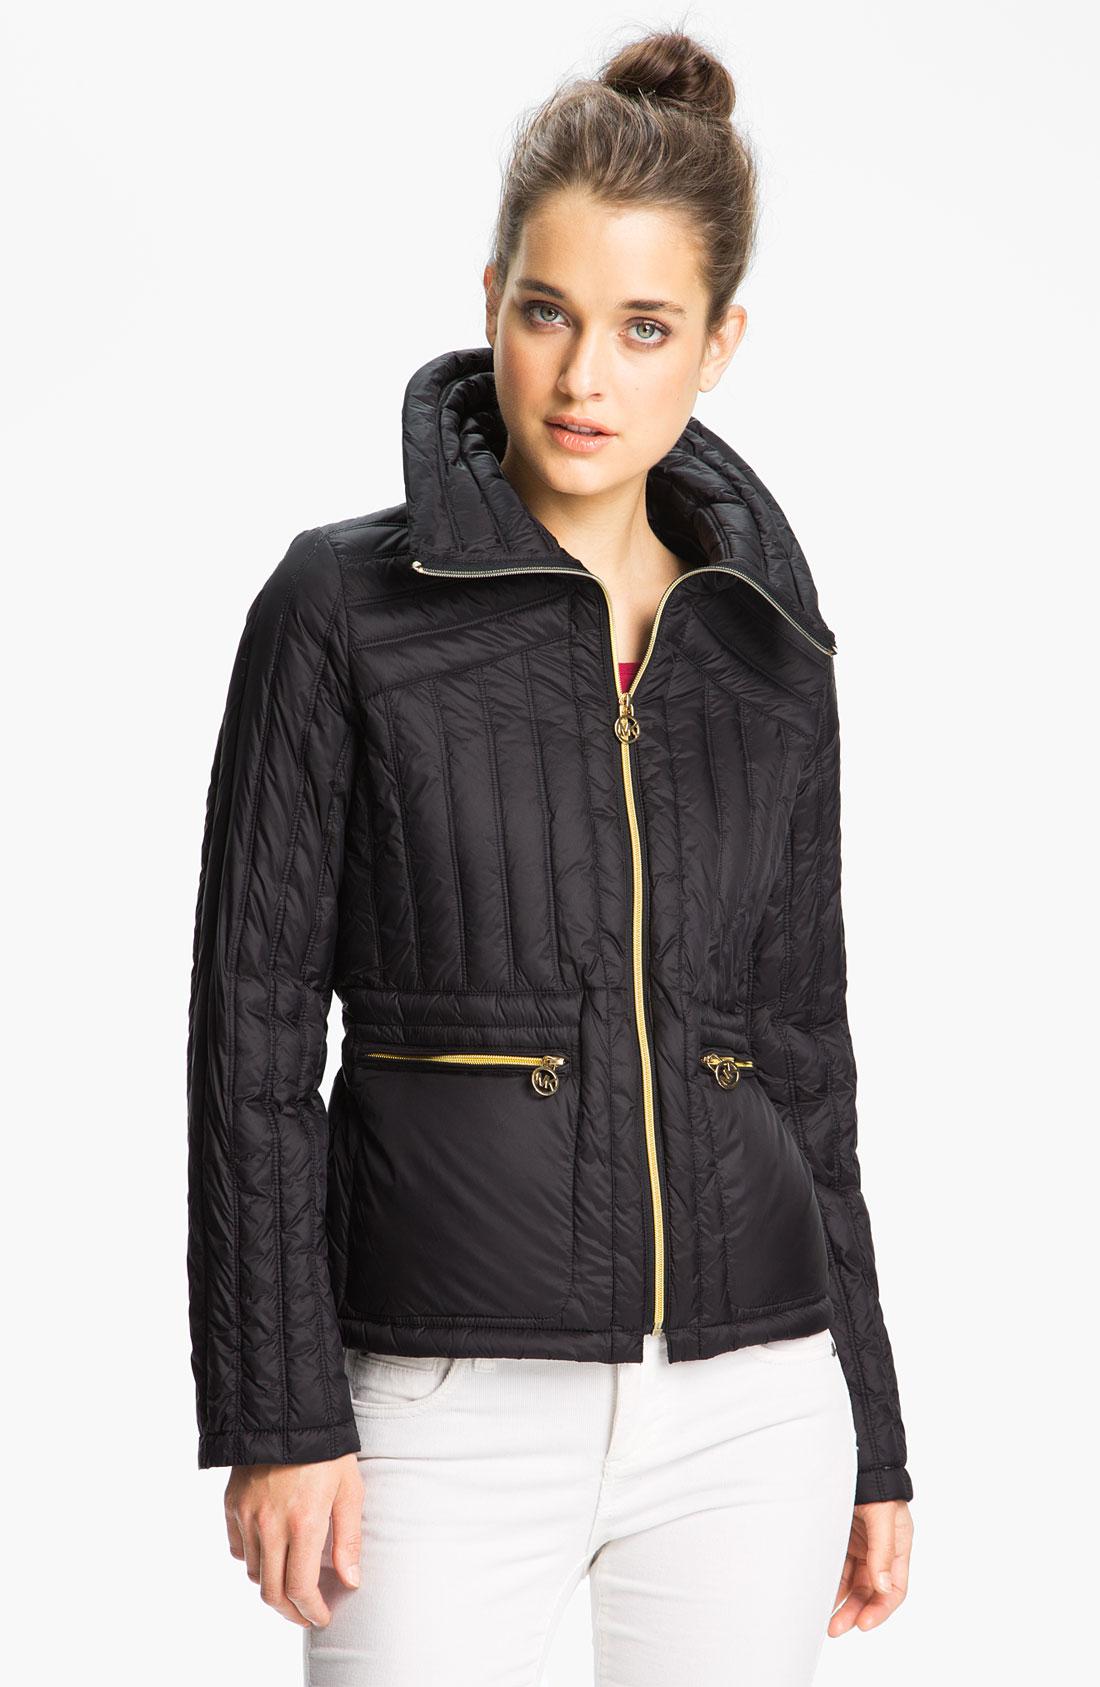 Michael kors womens jackets